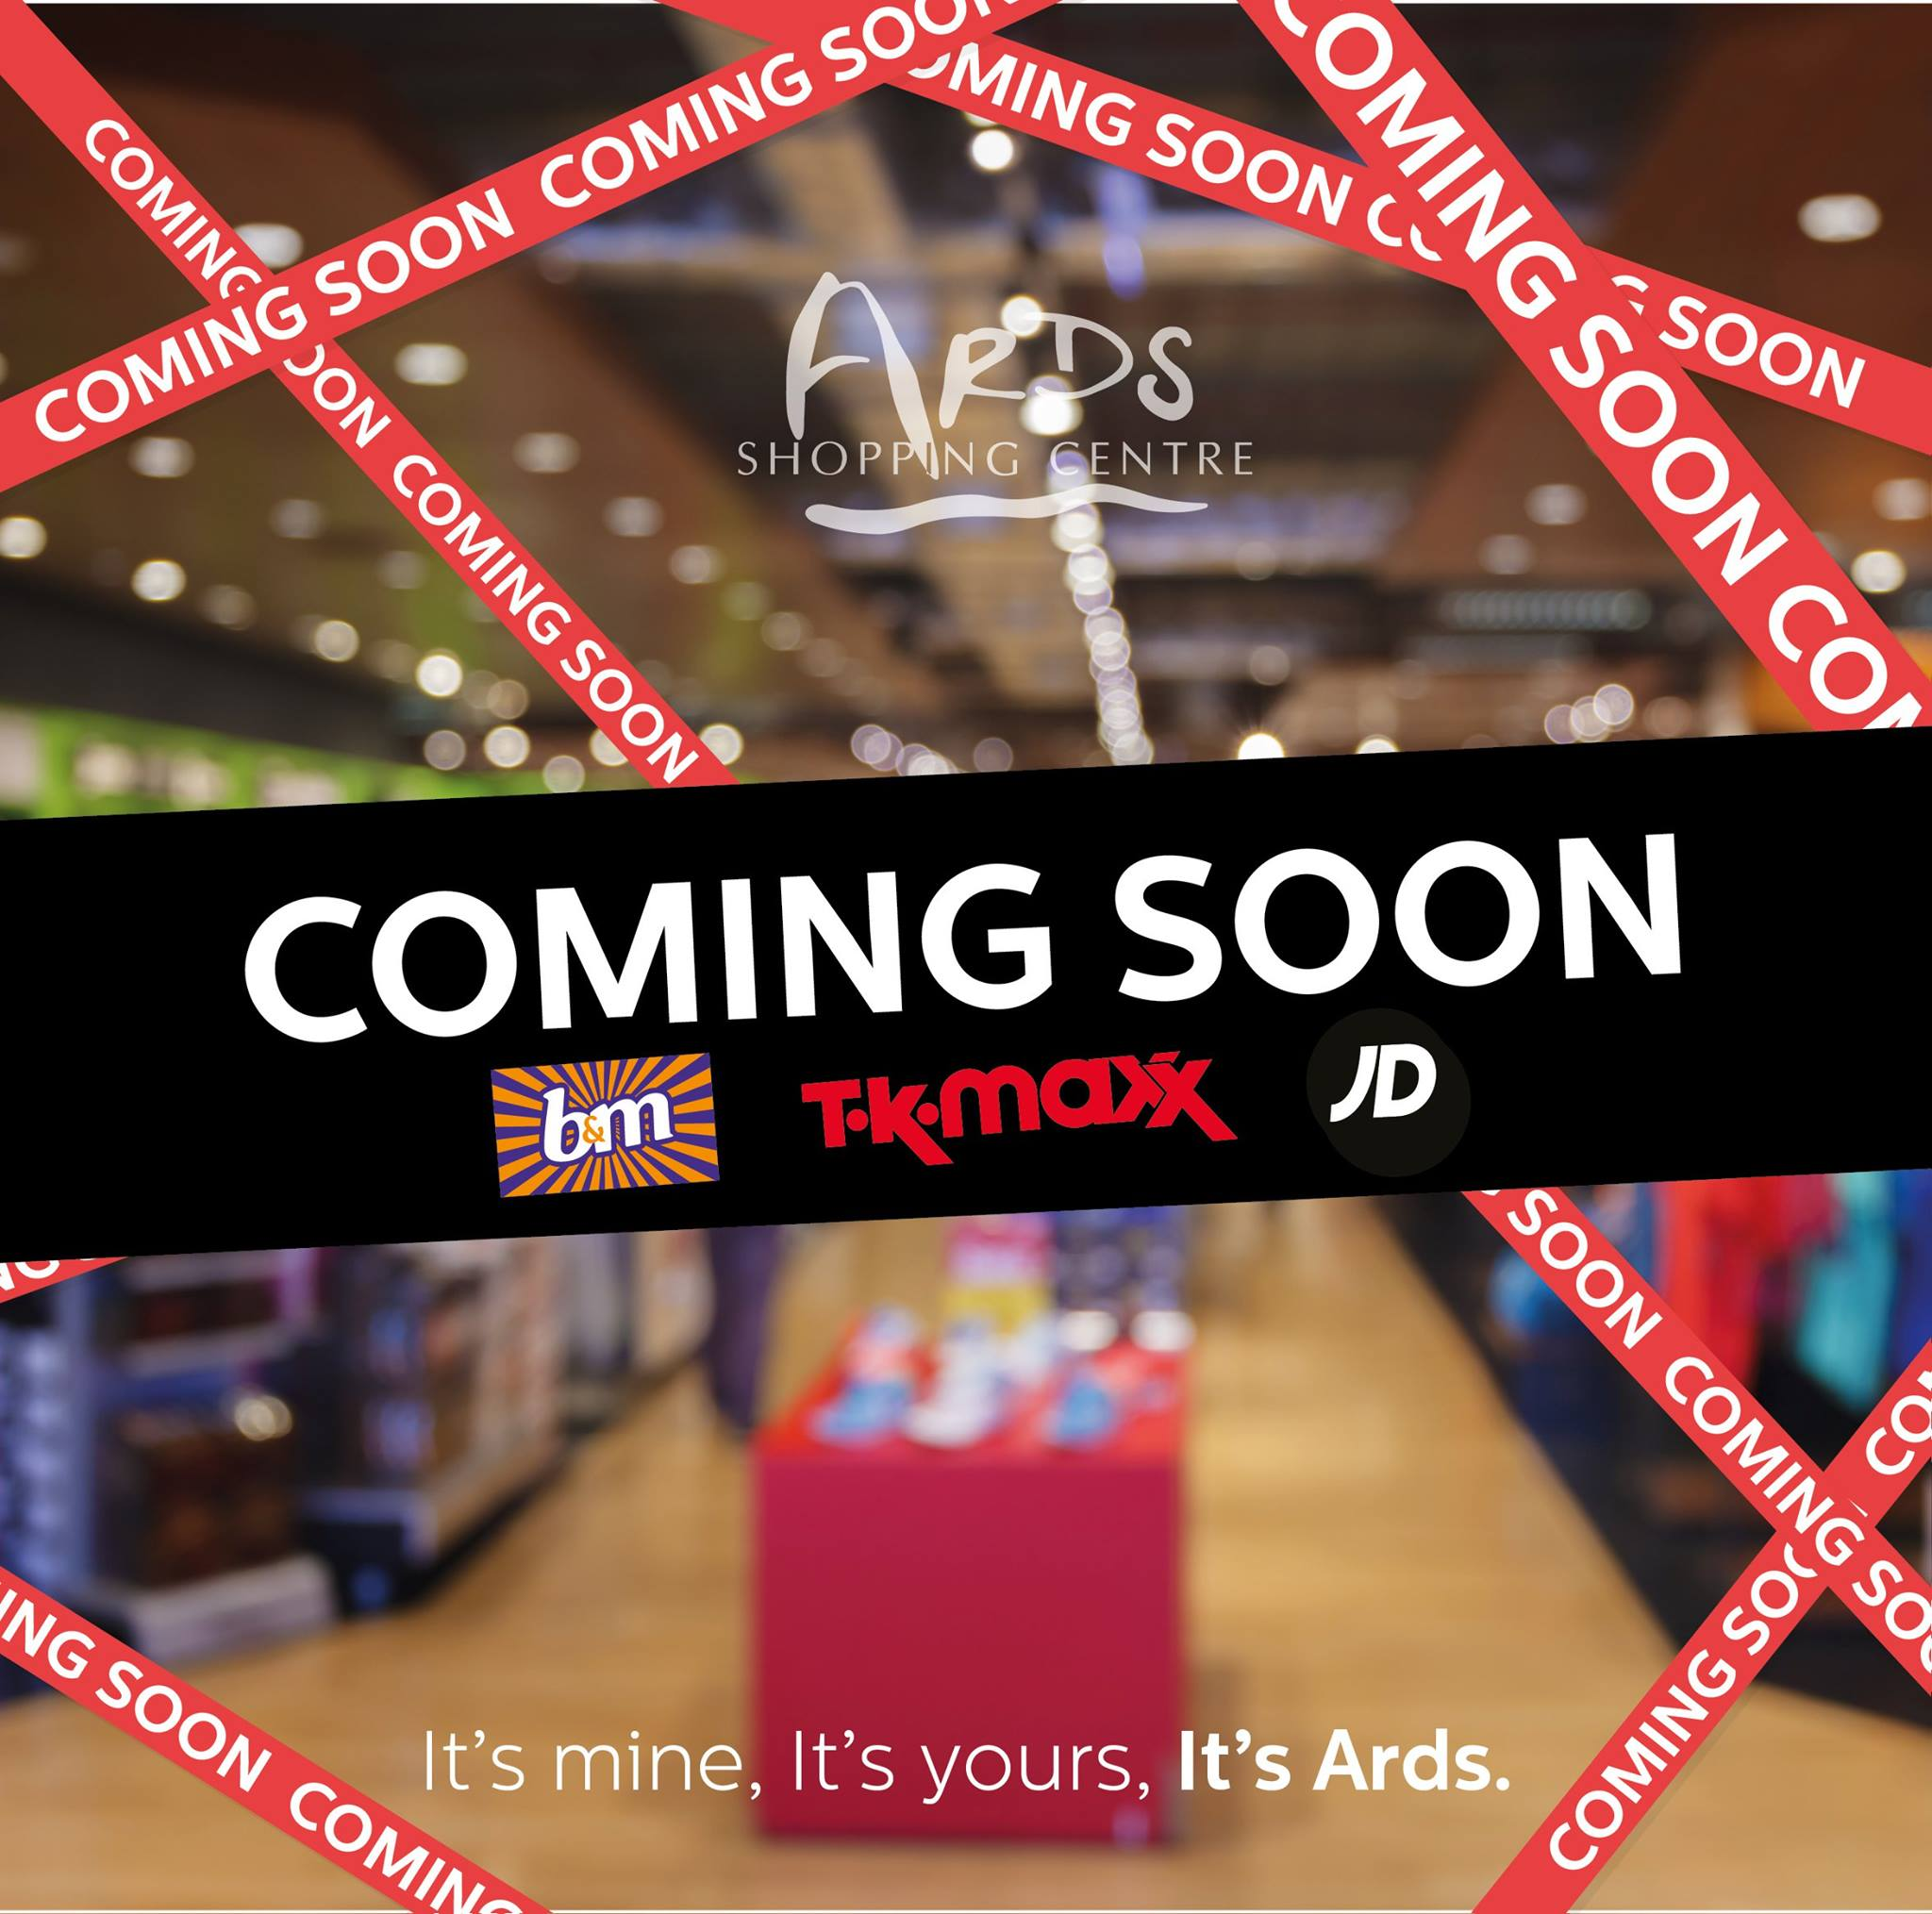 Ards Shopping Centre - Ards Shopping Centre recibirá a TK Maxx, B&M Bargains y JD Sports